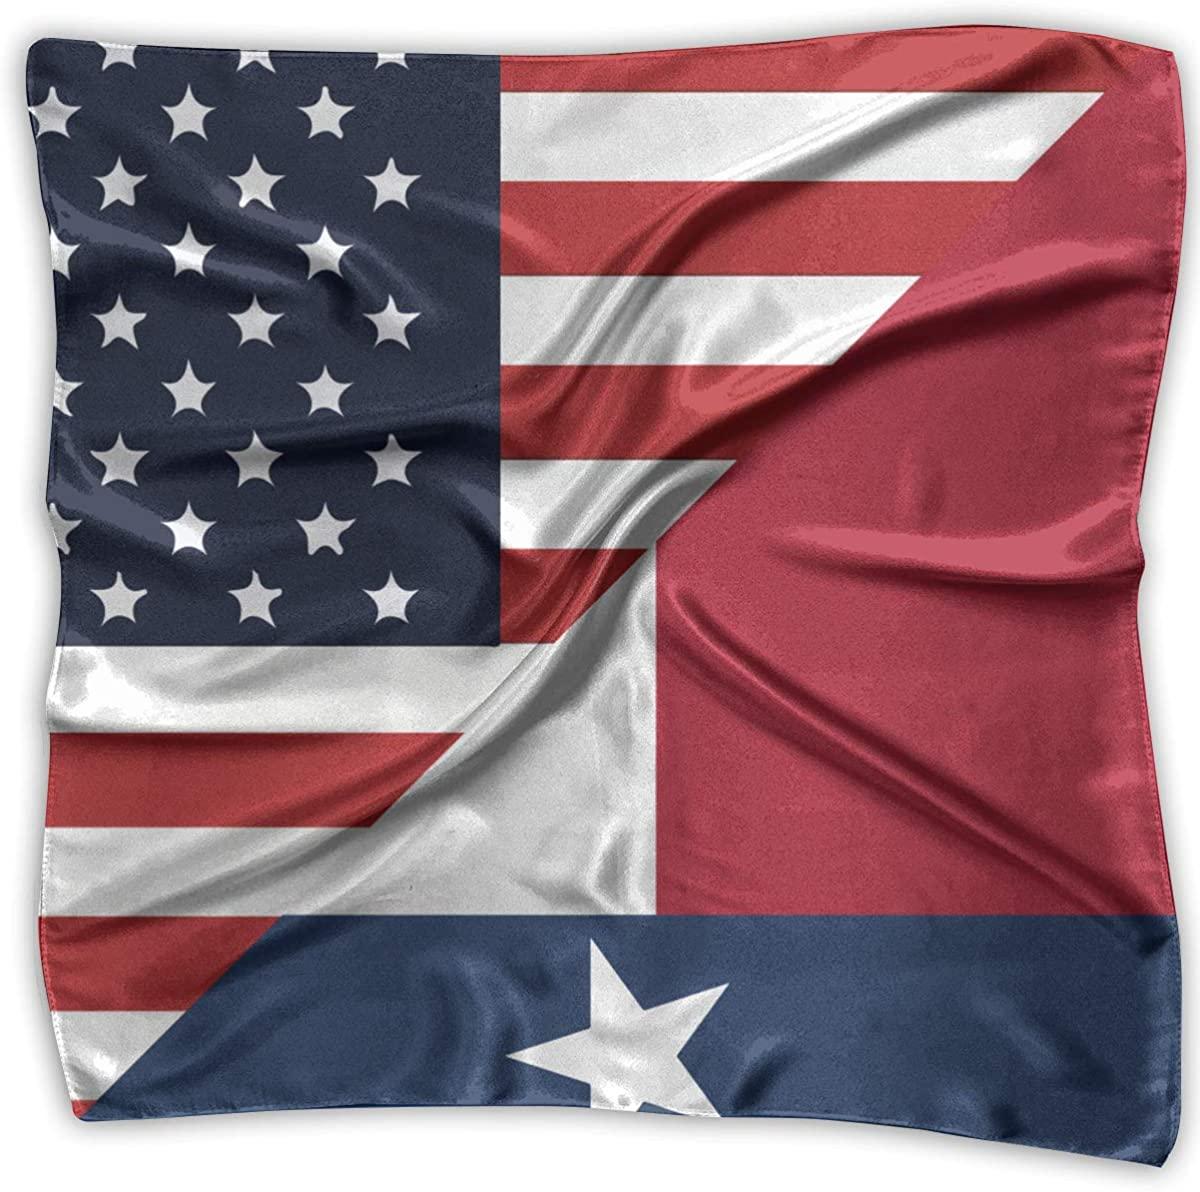 America Texas State Flag Women's Handkerchief Square Silk Party Handkerchiefs